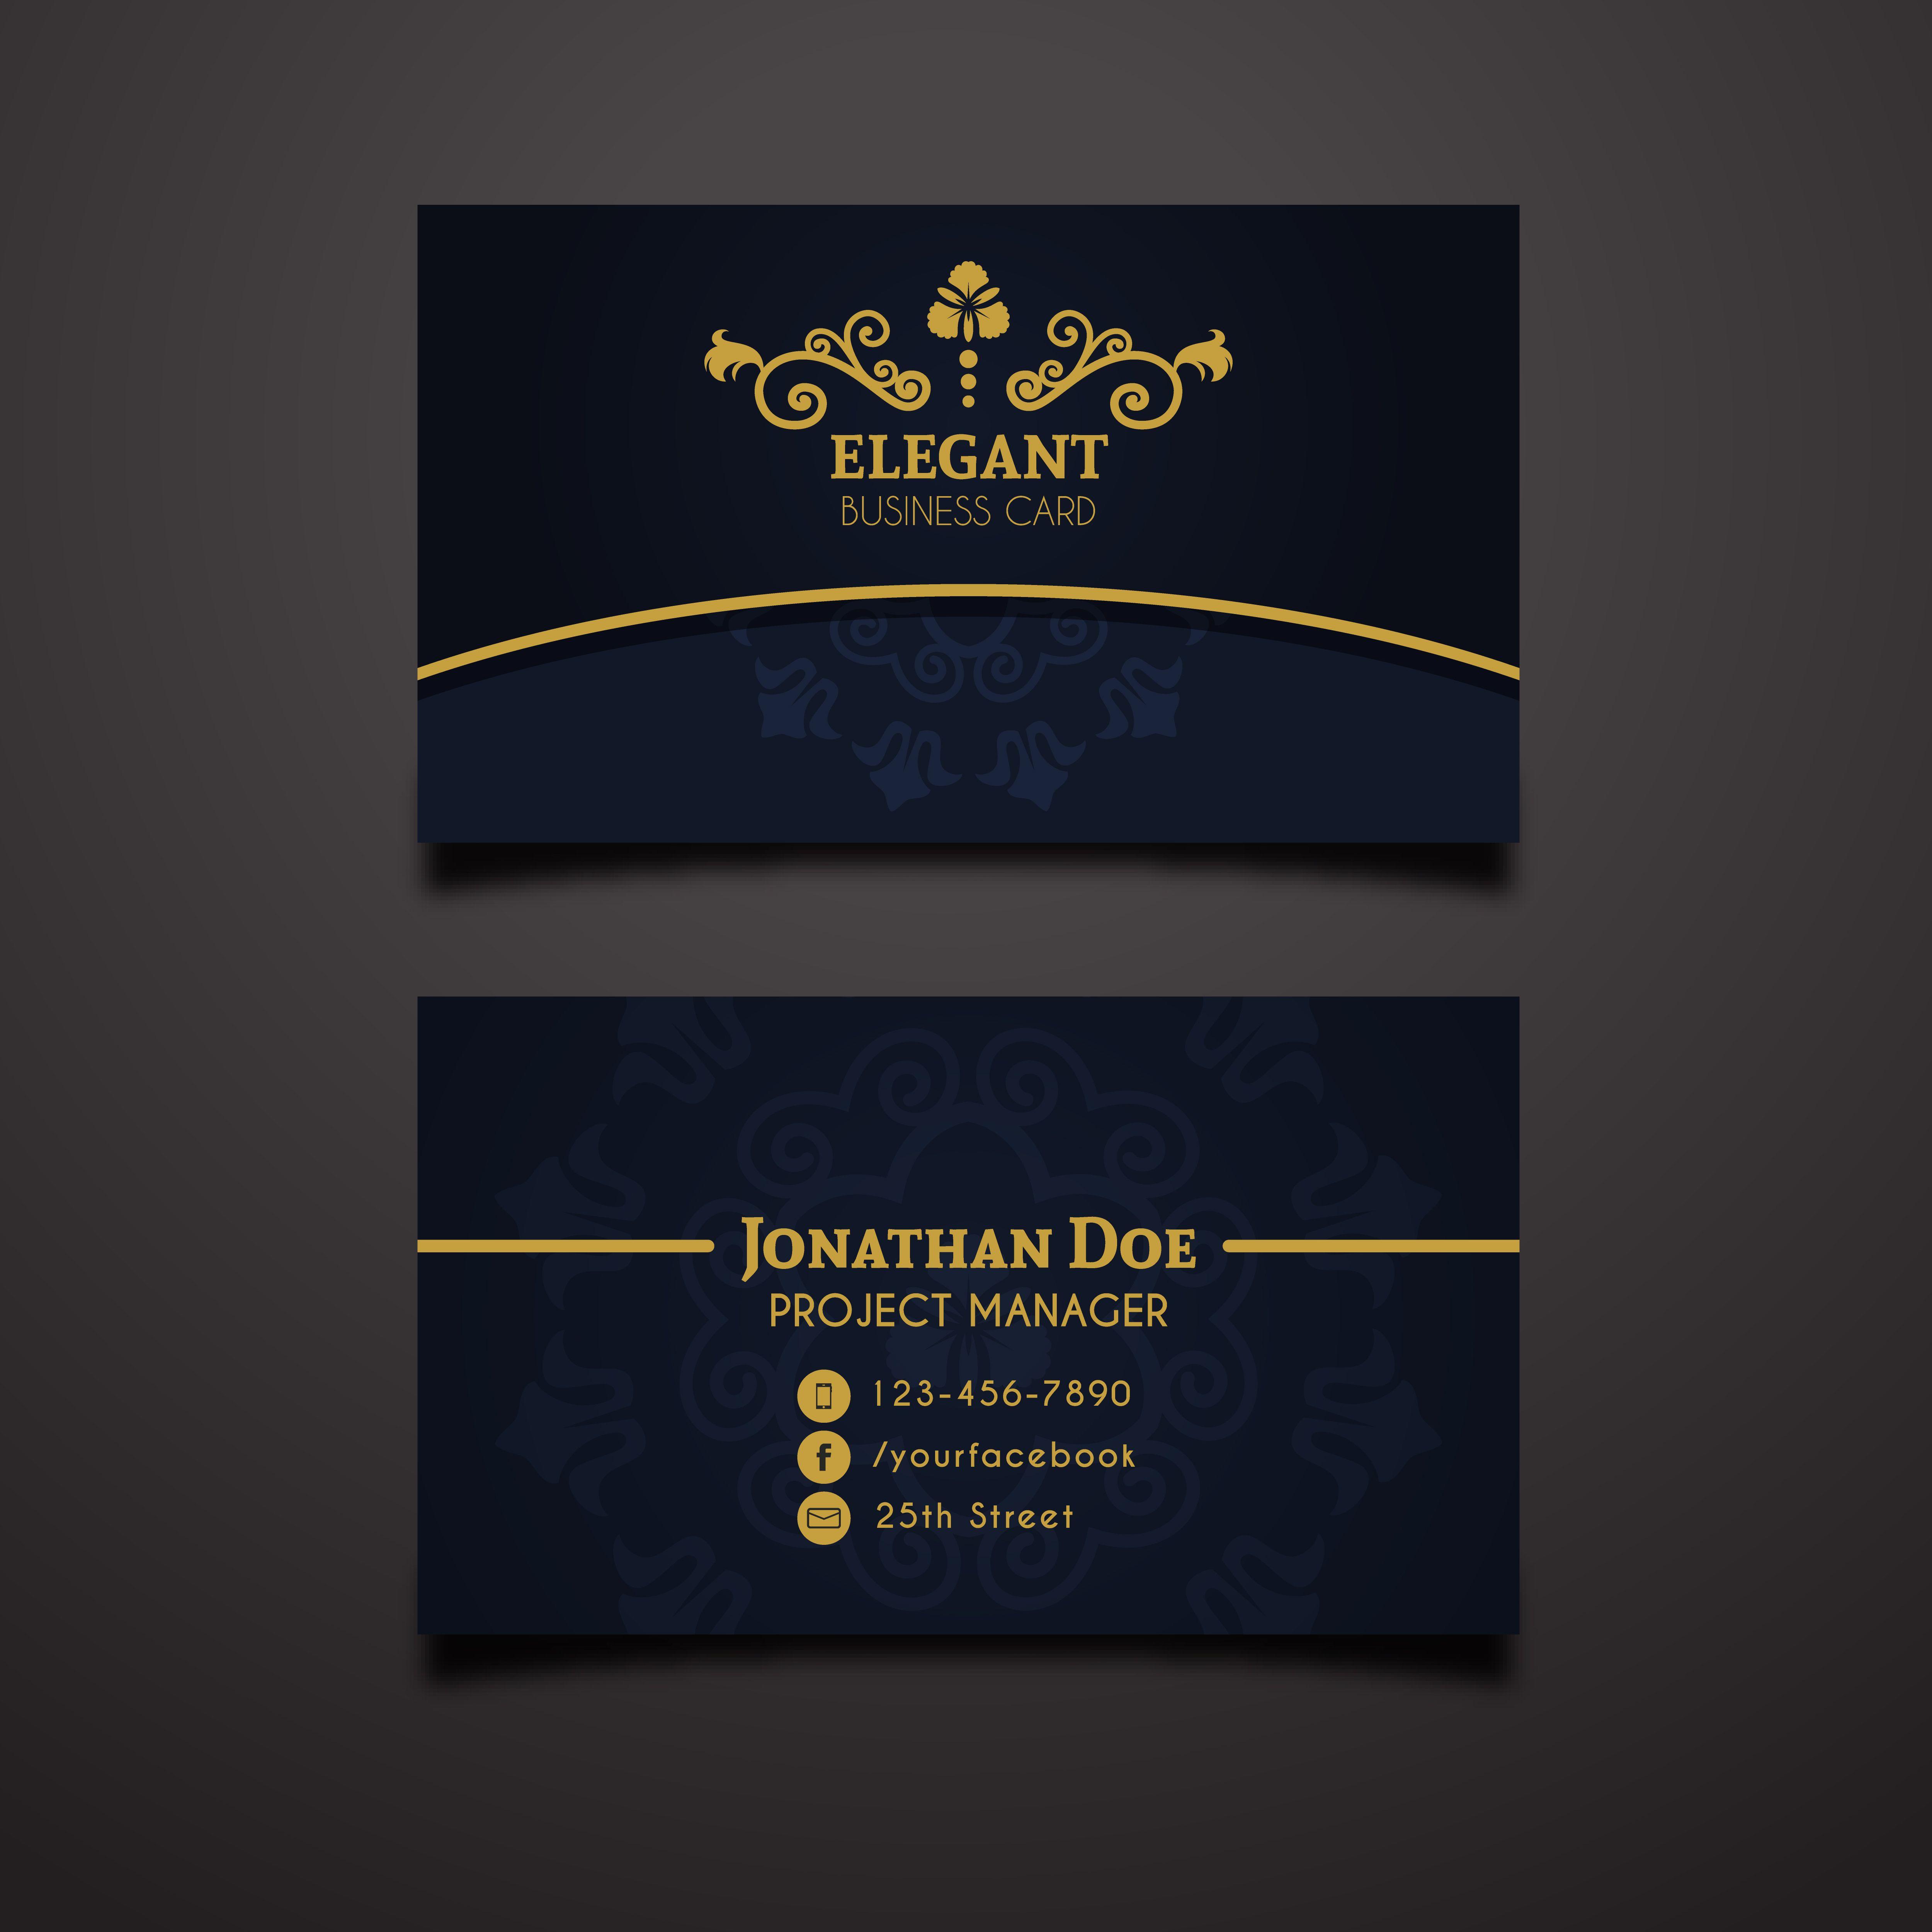 How To Make A Visiting Card Fast And Easy Bangla Tutorial Adobe Illust Business Card Design Card Design Online Design